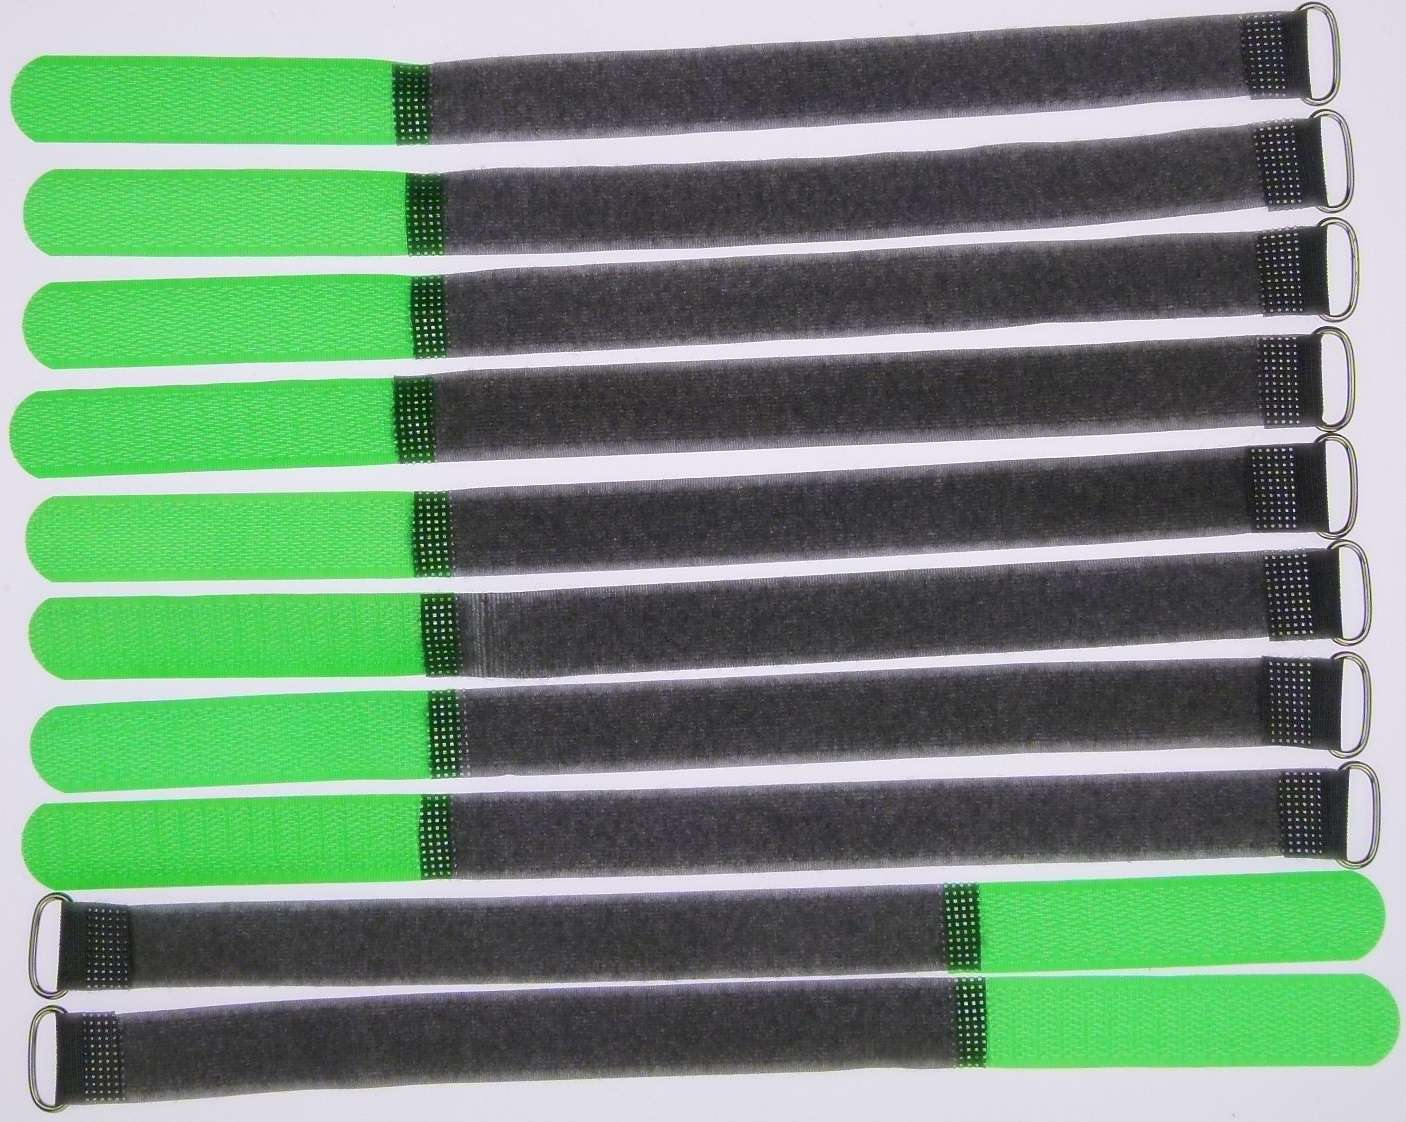 20 Klettkabelbinder 300 x 20 mm neongelb Klett Kabelbinder Klettband Kabelklett